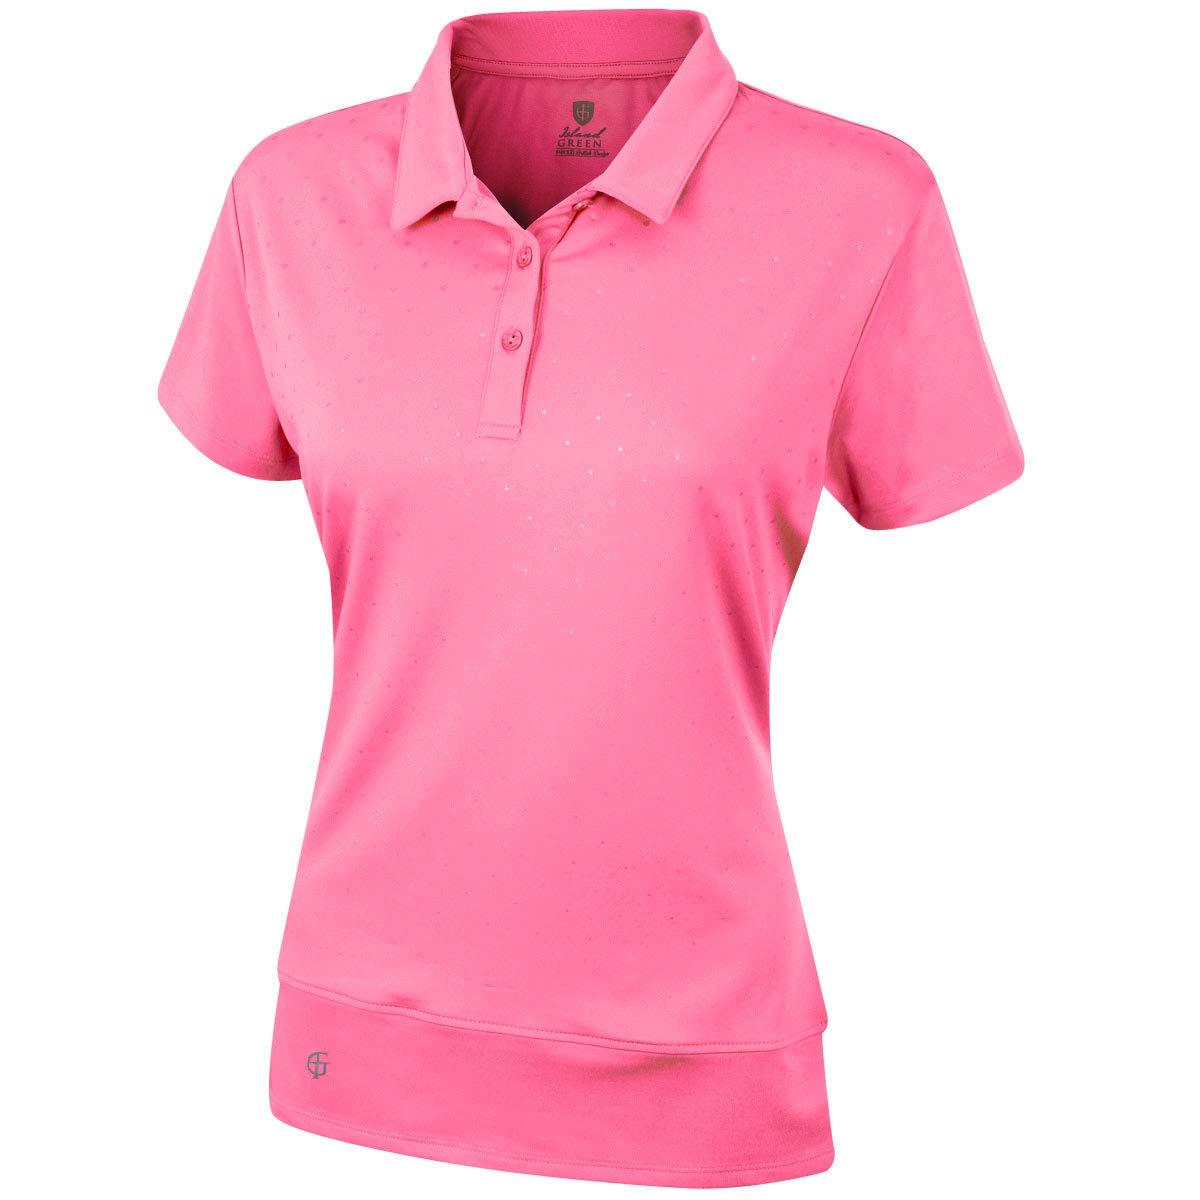 Island Green Womens 2019 Polka Dot Polo Shirt